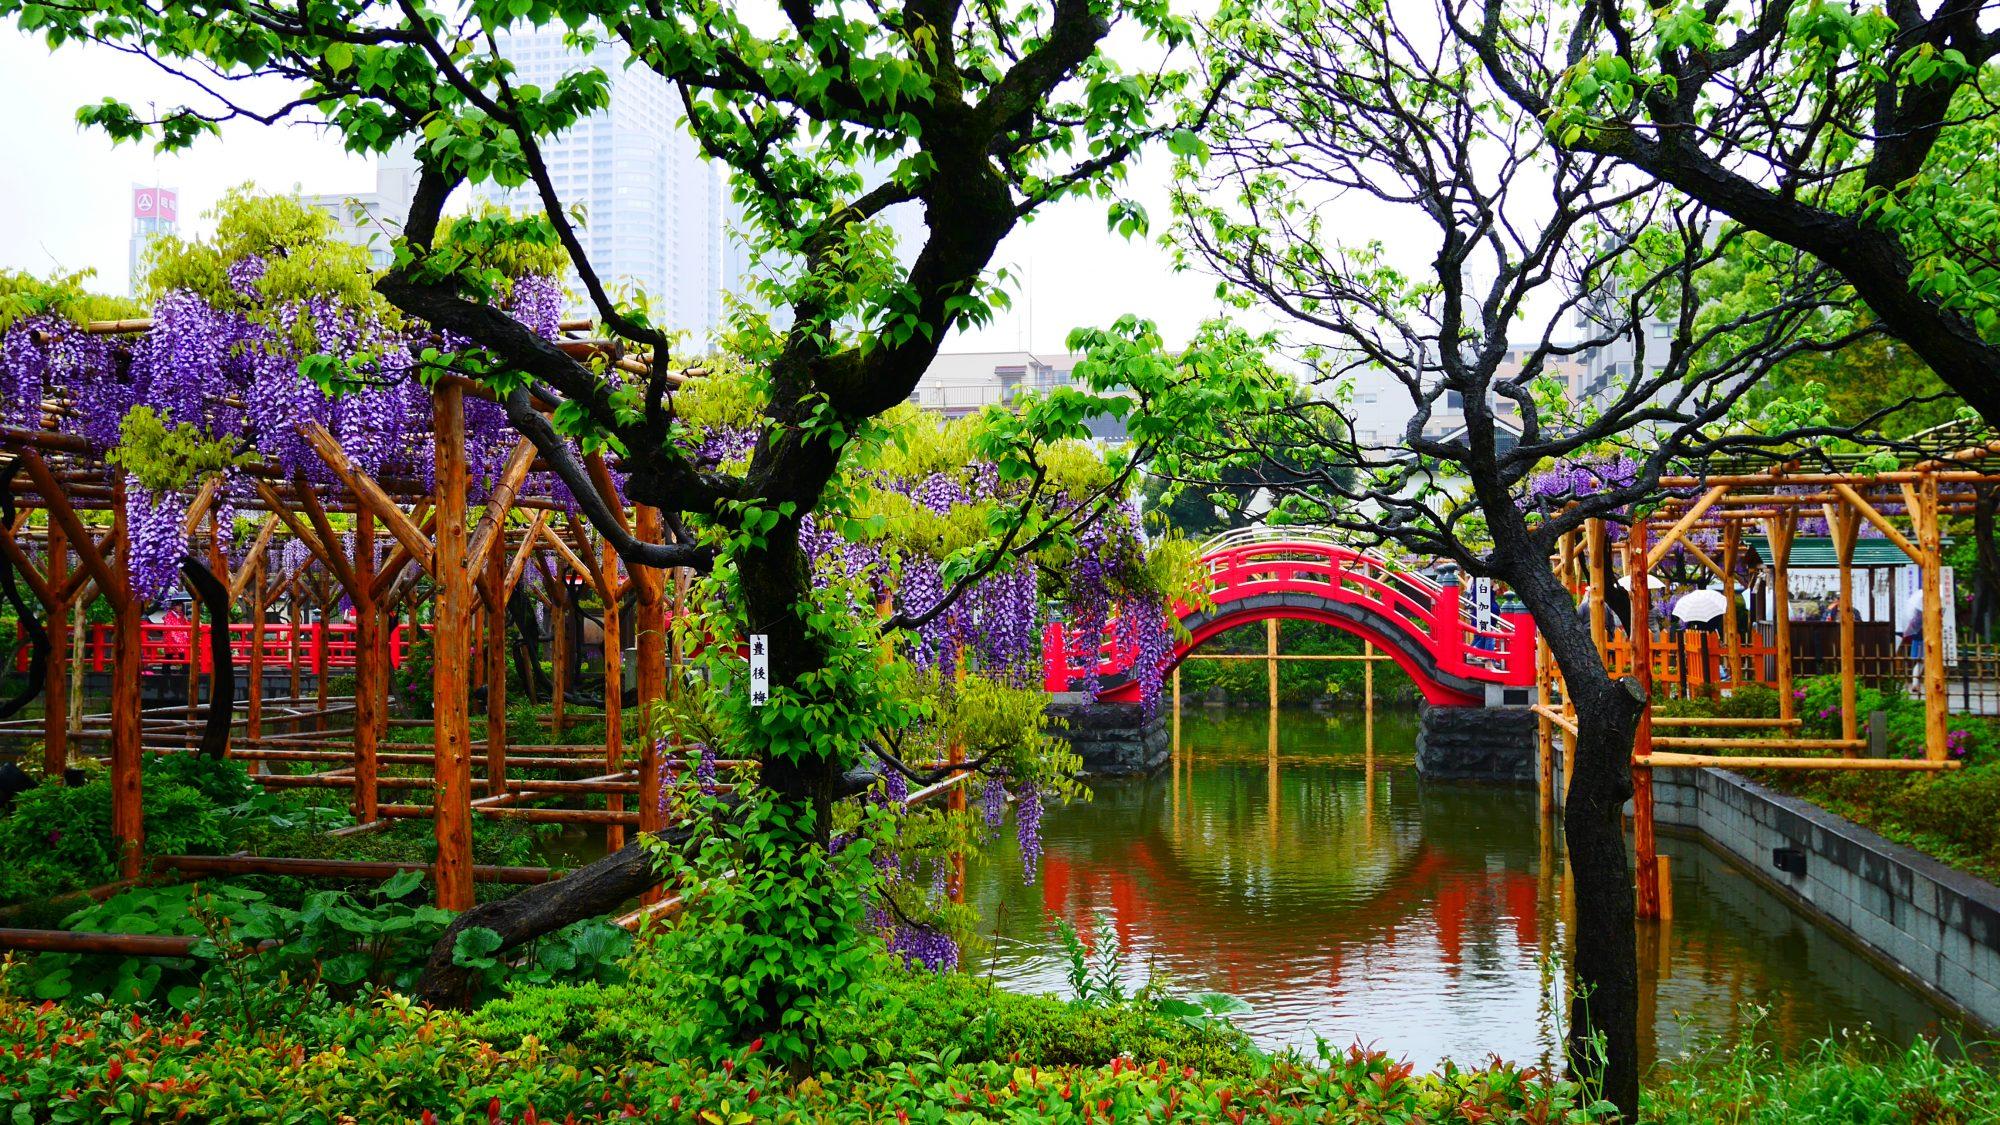 A wisteria-filled utopia